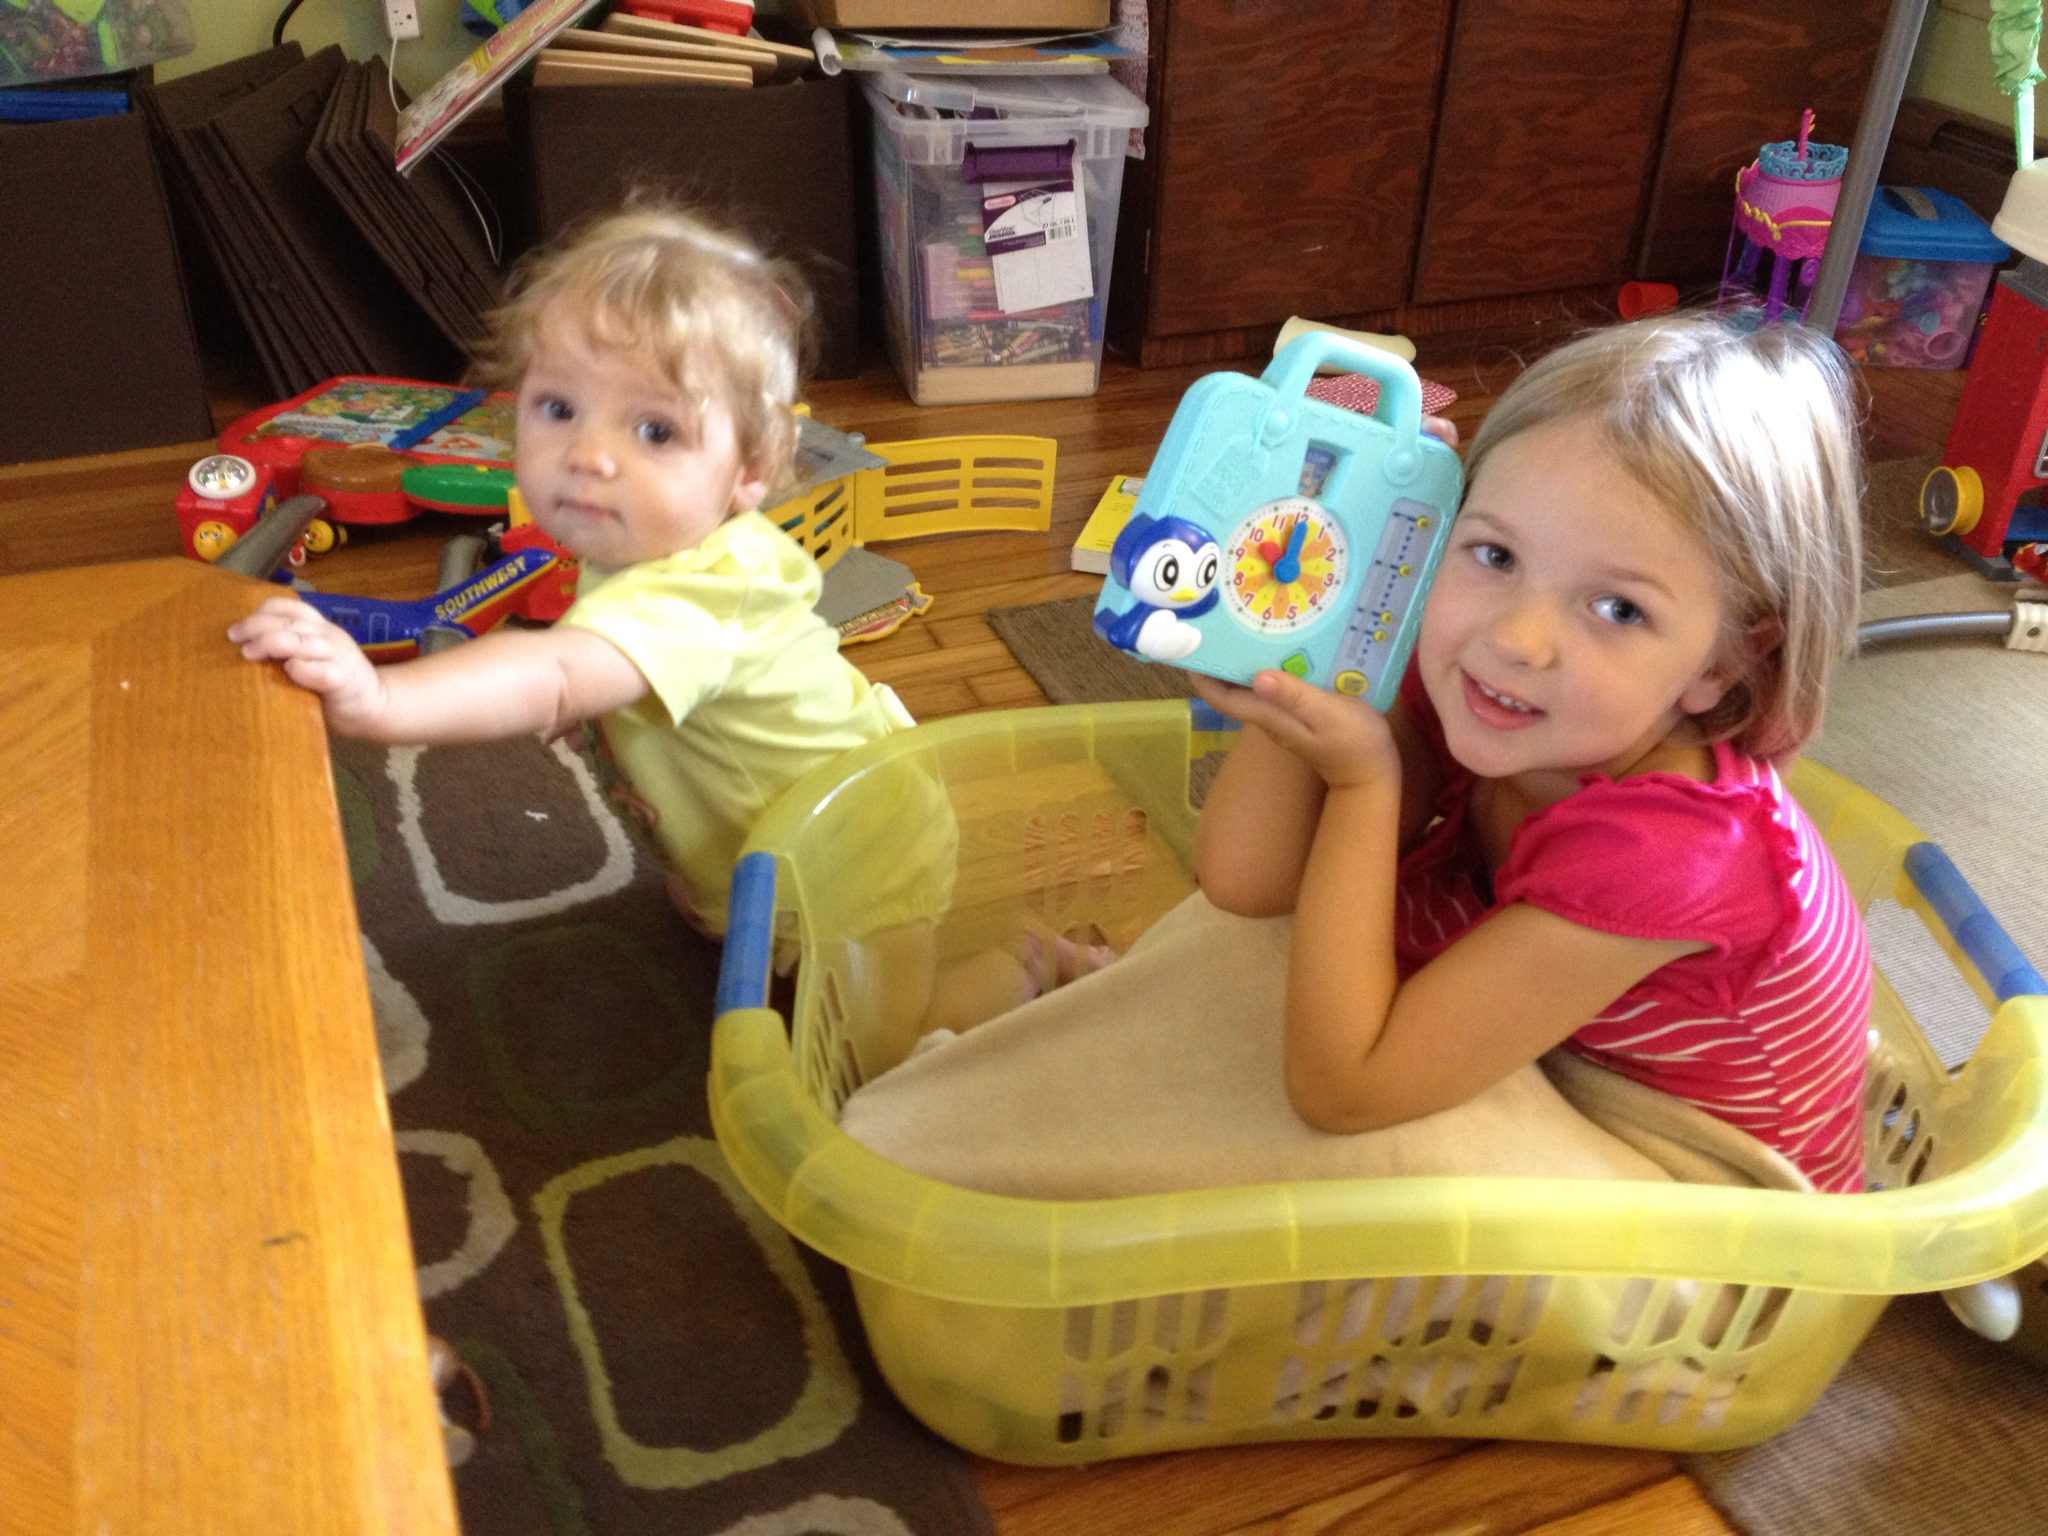 Review-Giveaway: WonderMind Multi-Sensory Learning Kit – Preschool Kit